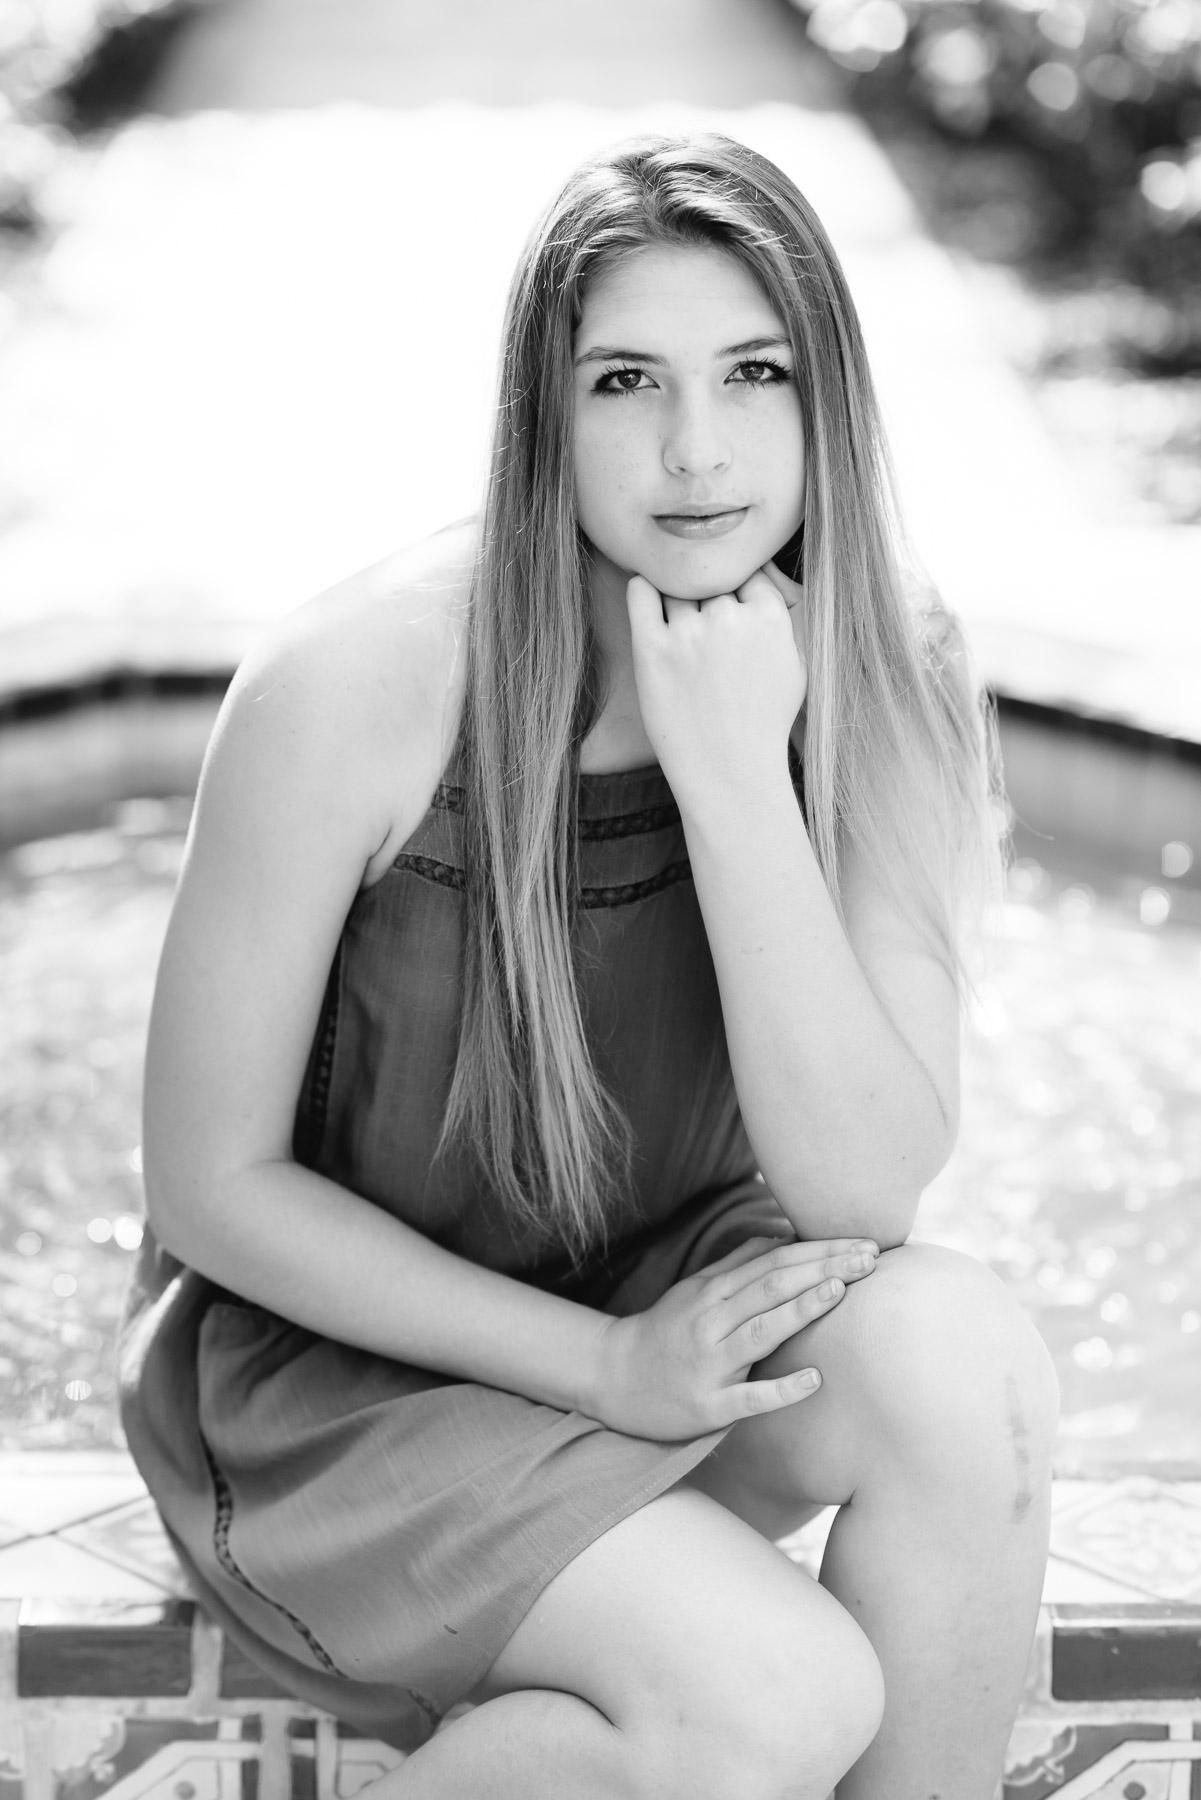 KateTaramykinStudios-Winter-Park-Senior-Portraits-Claire-4.jpg